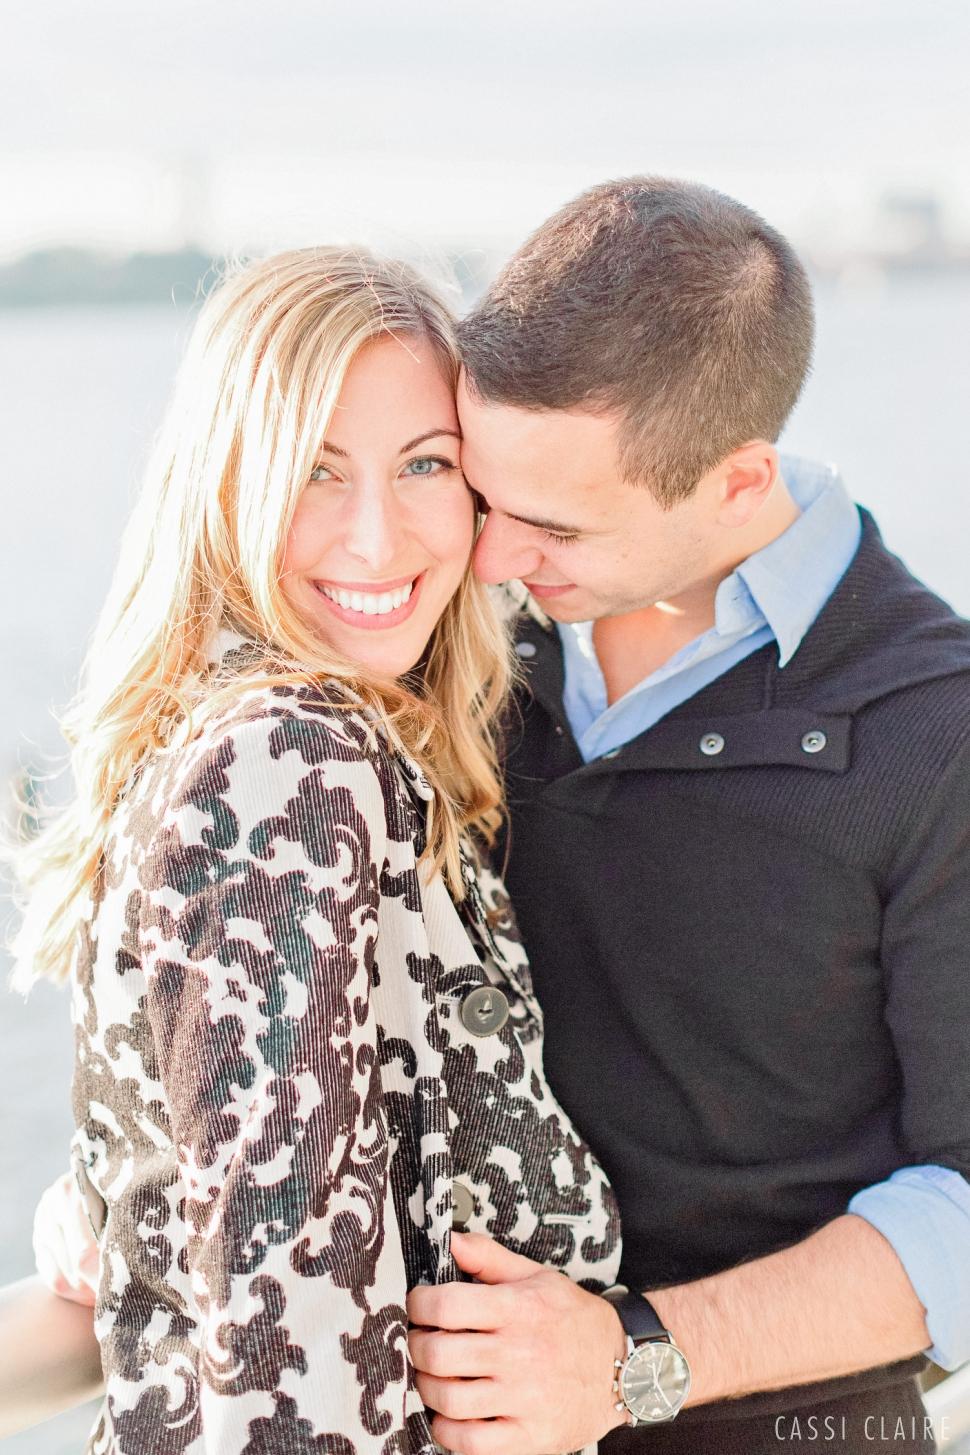 West-Village-Engagement-Photos-NYC-Wedding-Photographer_15.jpg